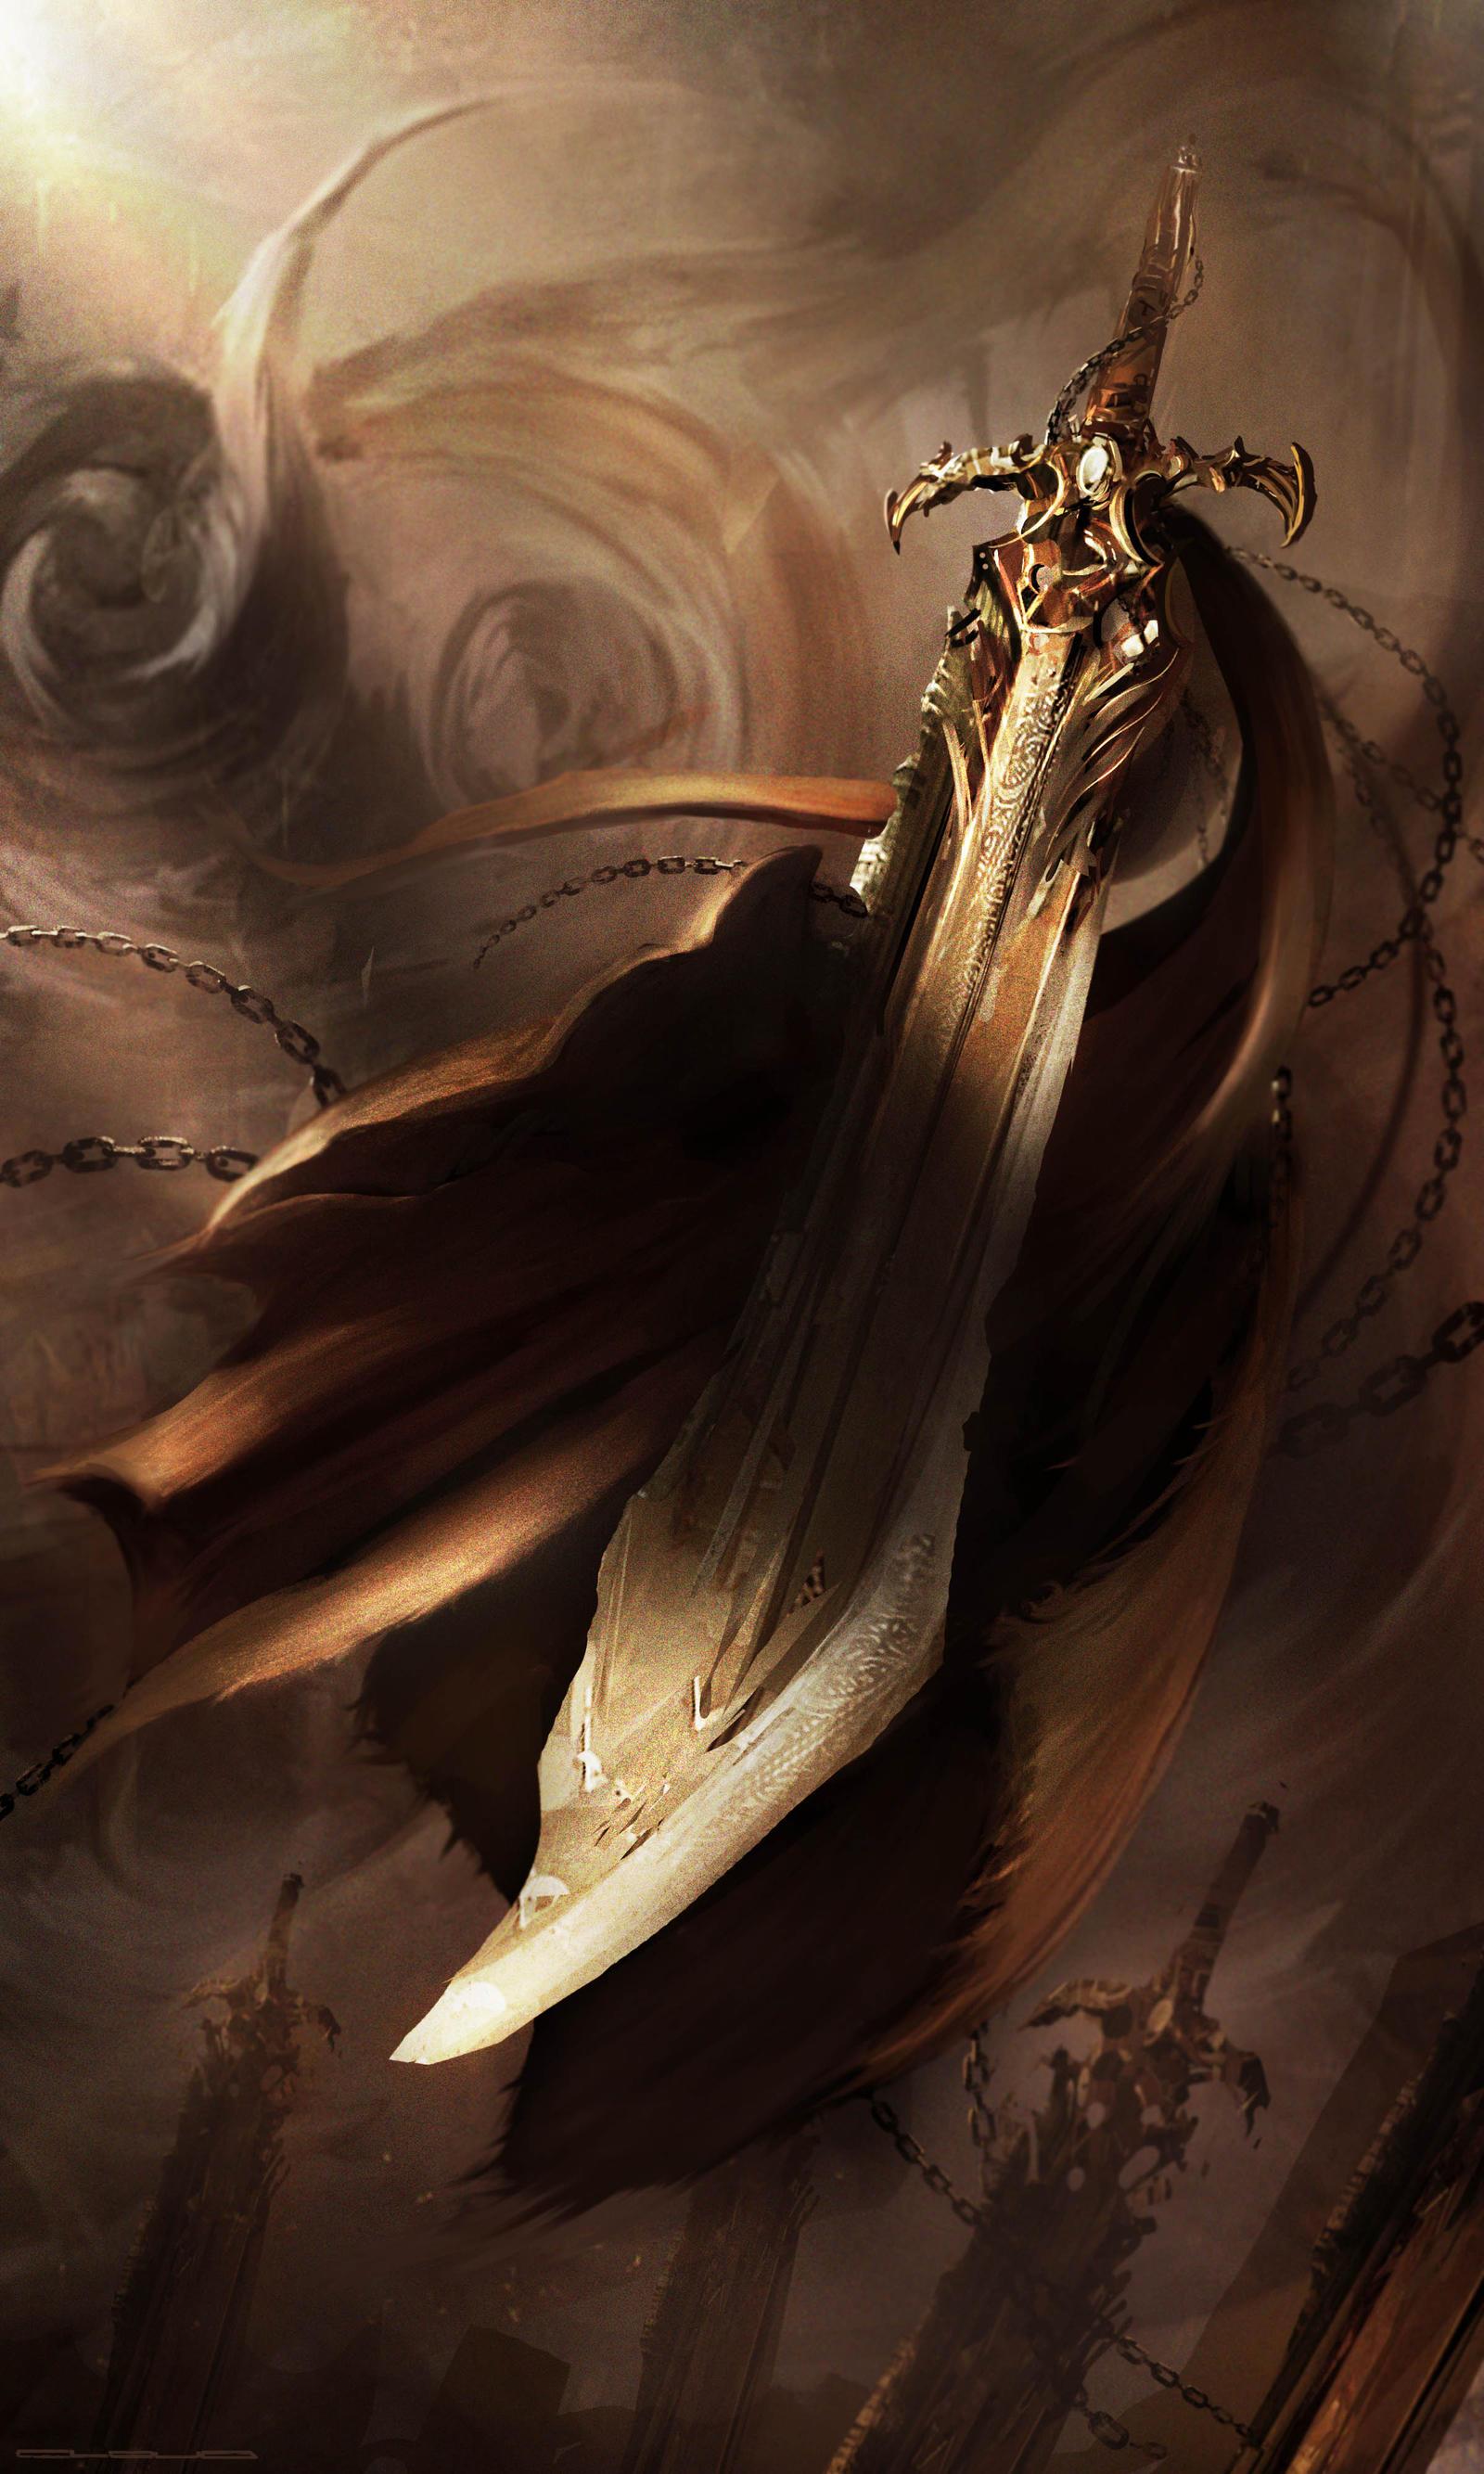 Blade of Death by Darkcloud013